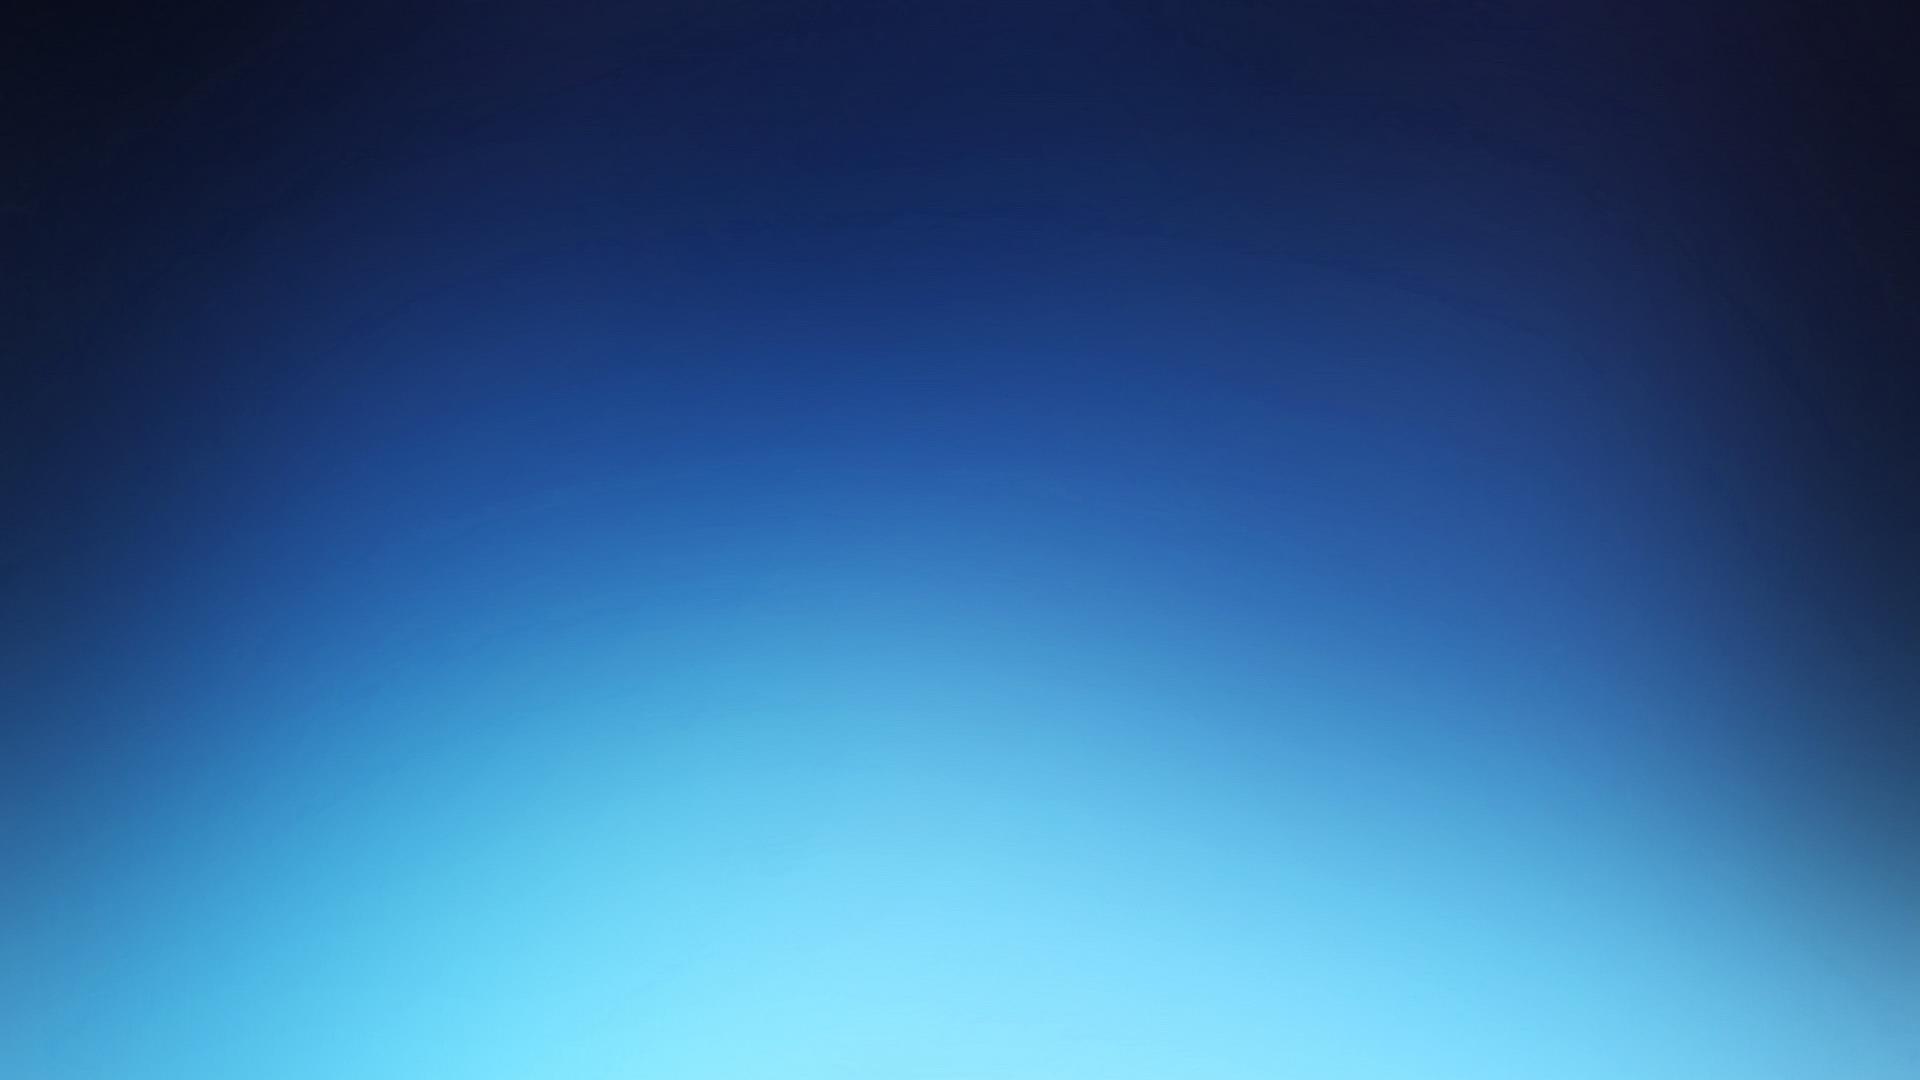 wallpaper background gradient blue - photo #1